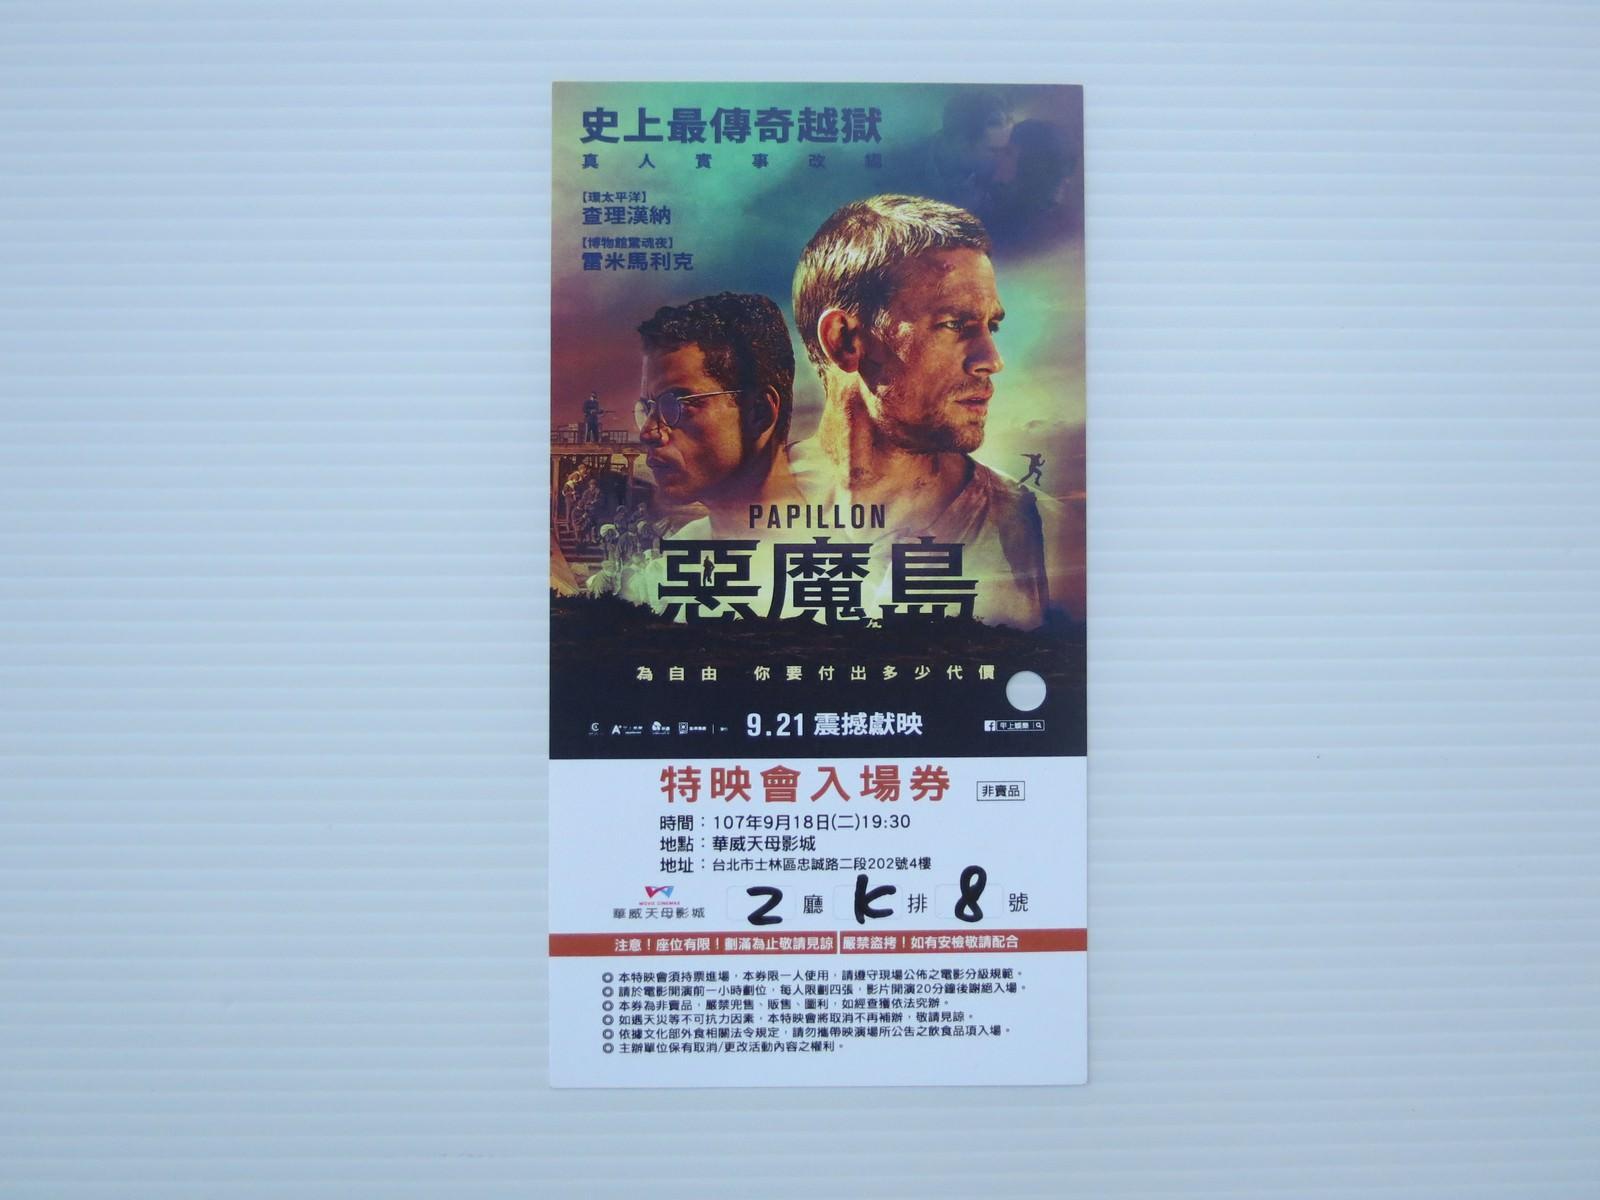 Movie, Papillon(美國, 2017) / 惡魔島(台灣) / 巴比龙(網路), 特映會電影票